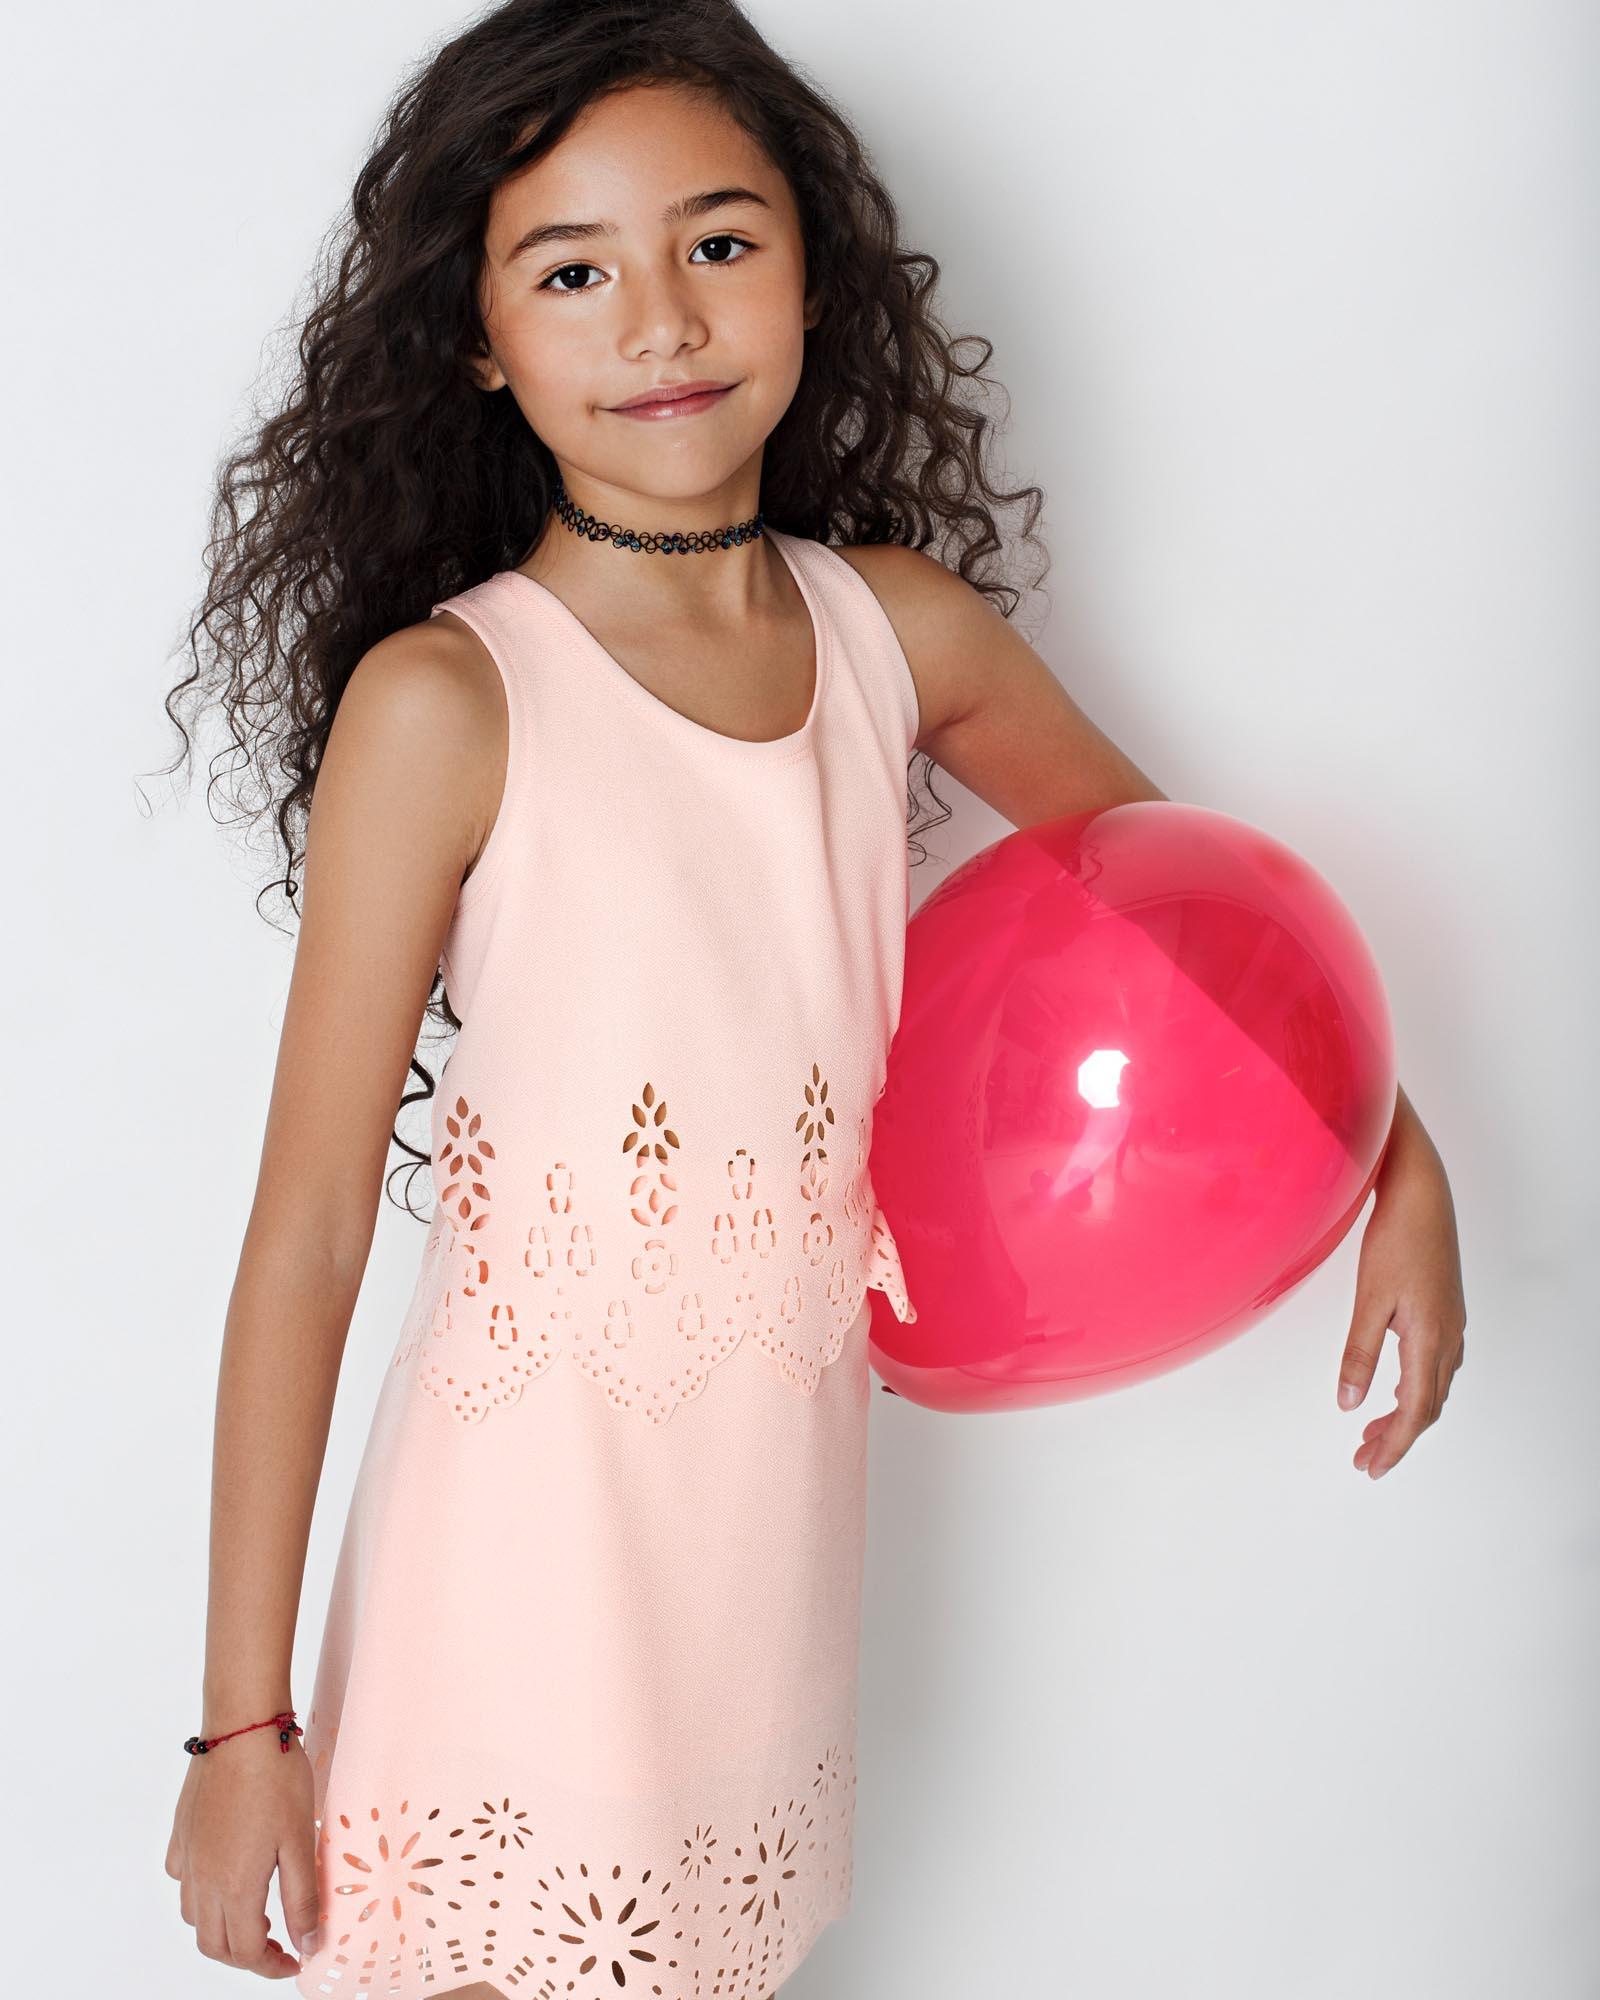 nyc-photographers-kids-modeling-10004.jpg